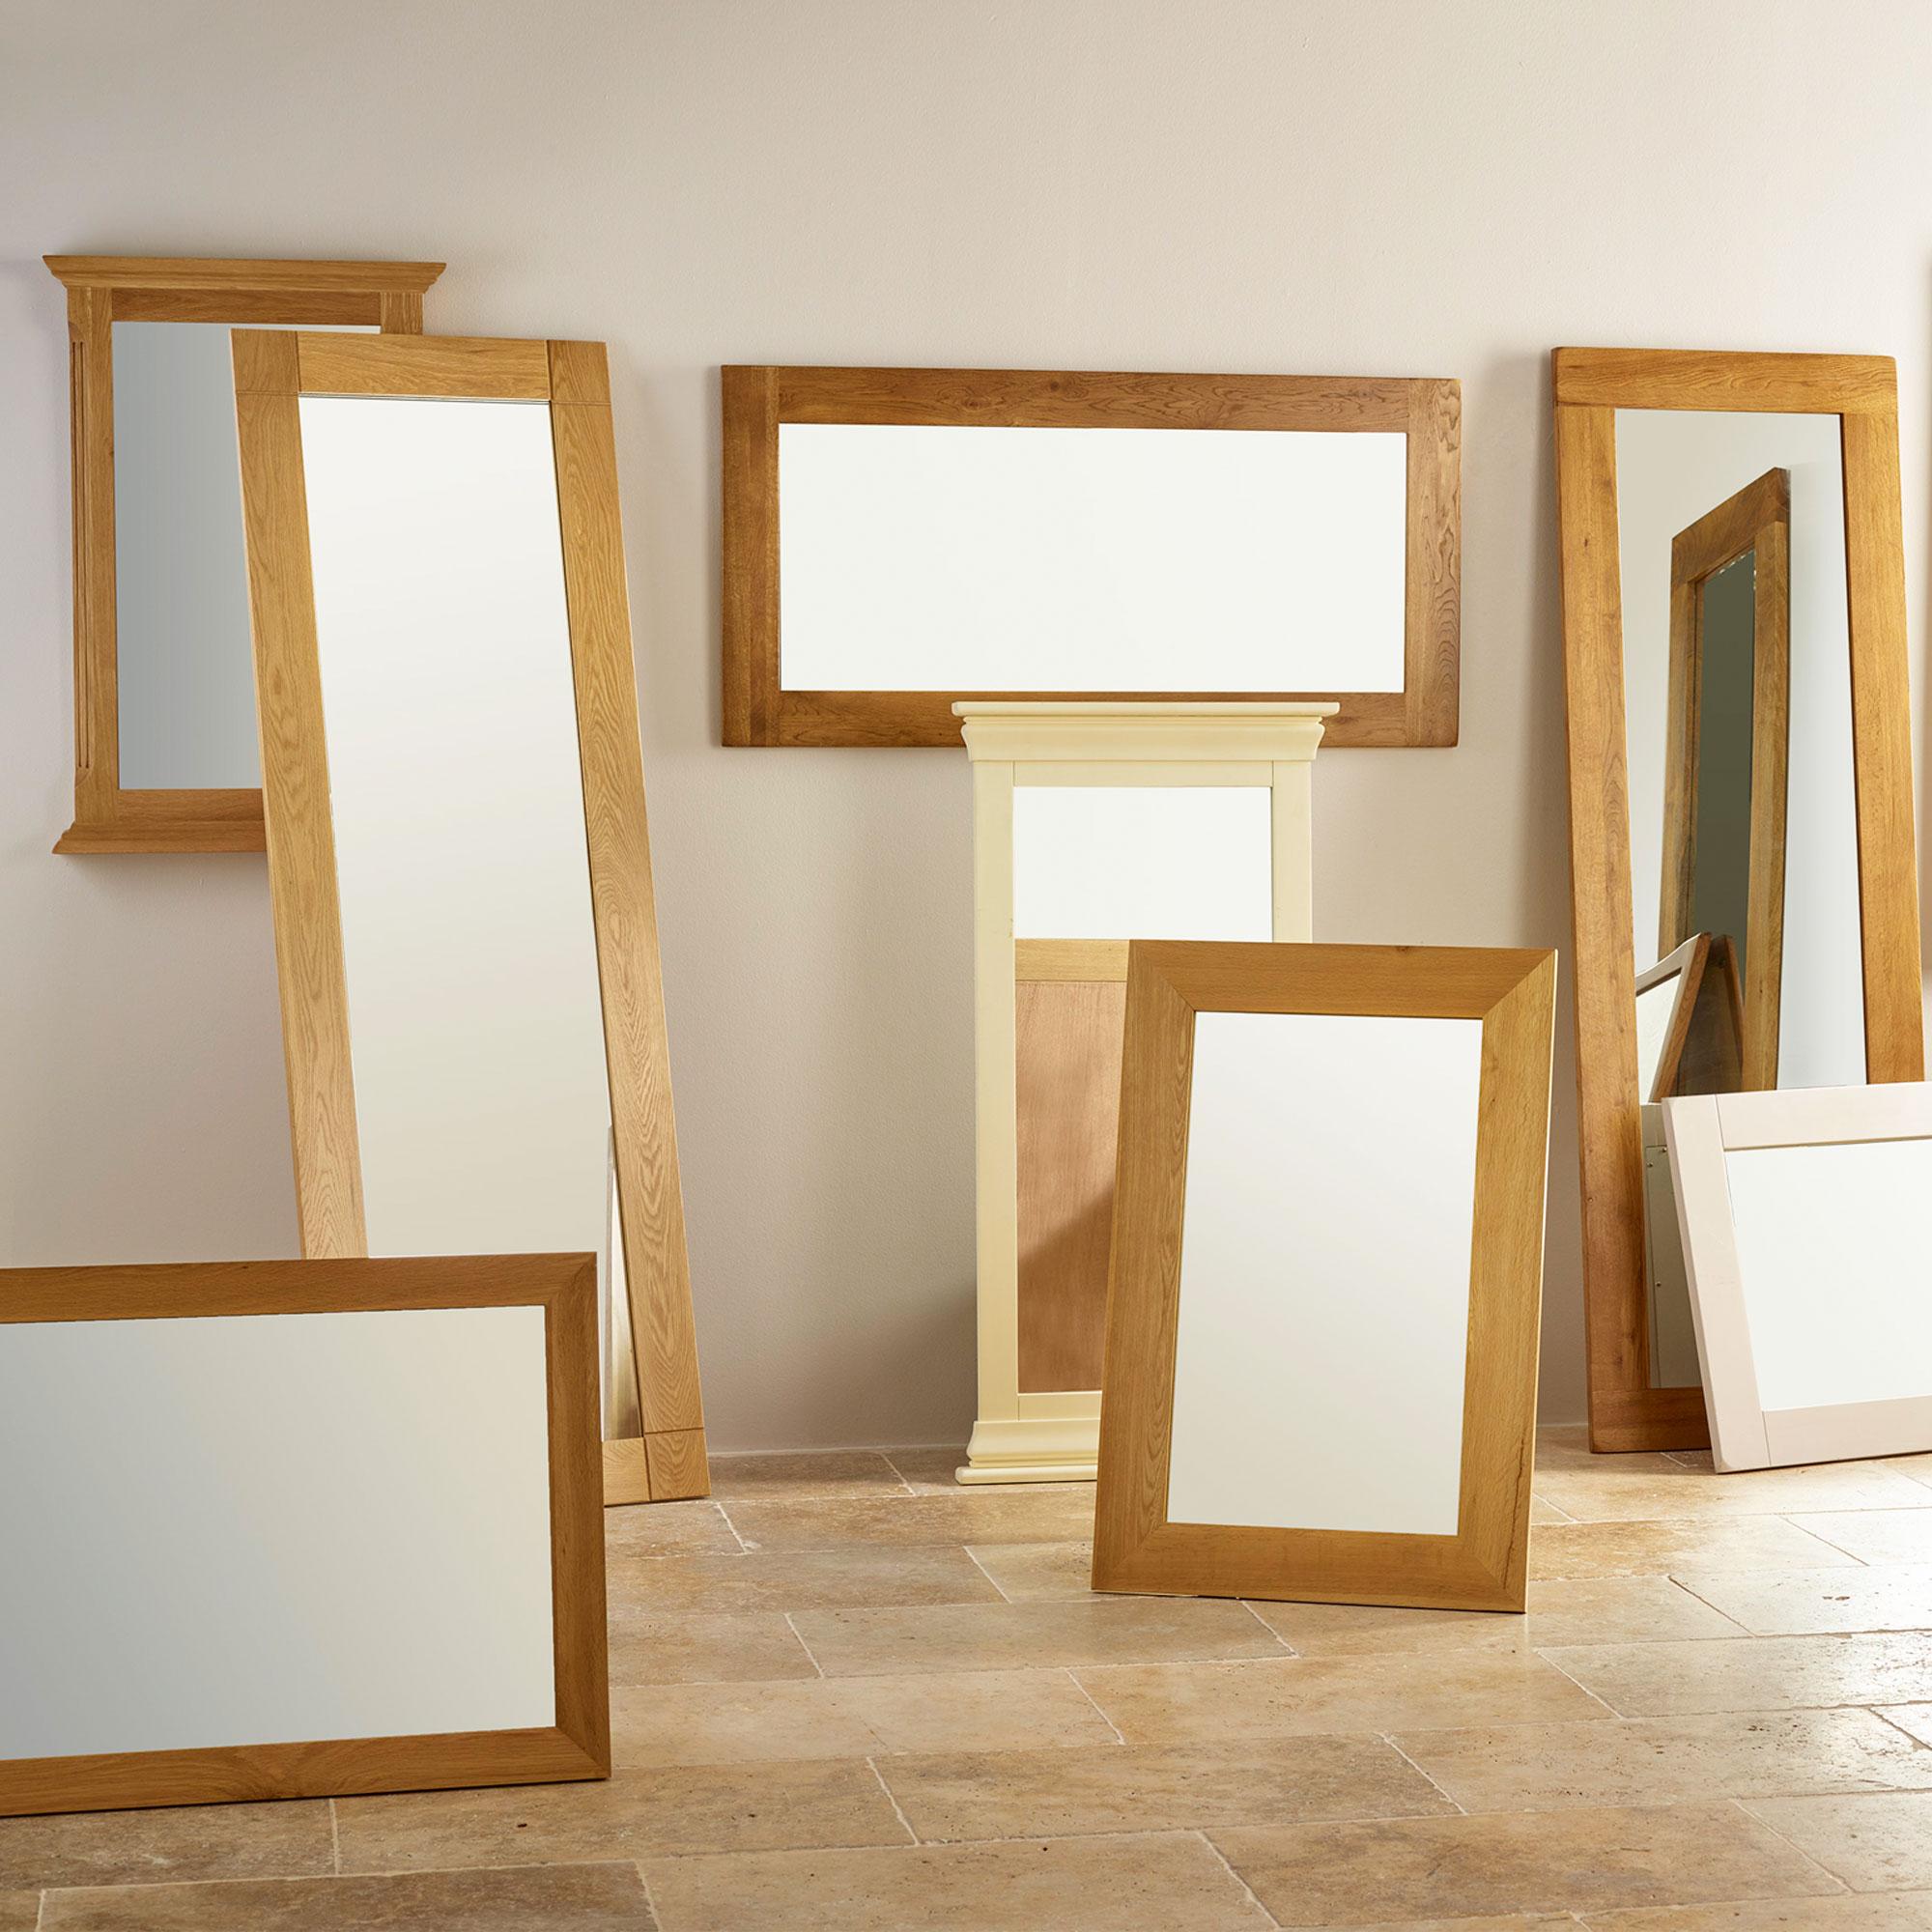 Mirrors | Wall & Table Mirrors | Oak Furnitureland